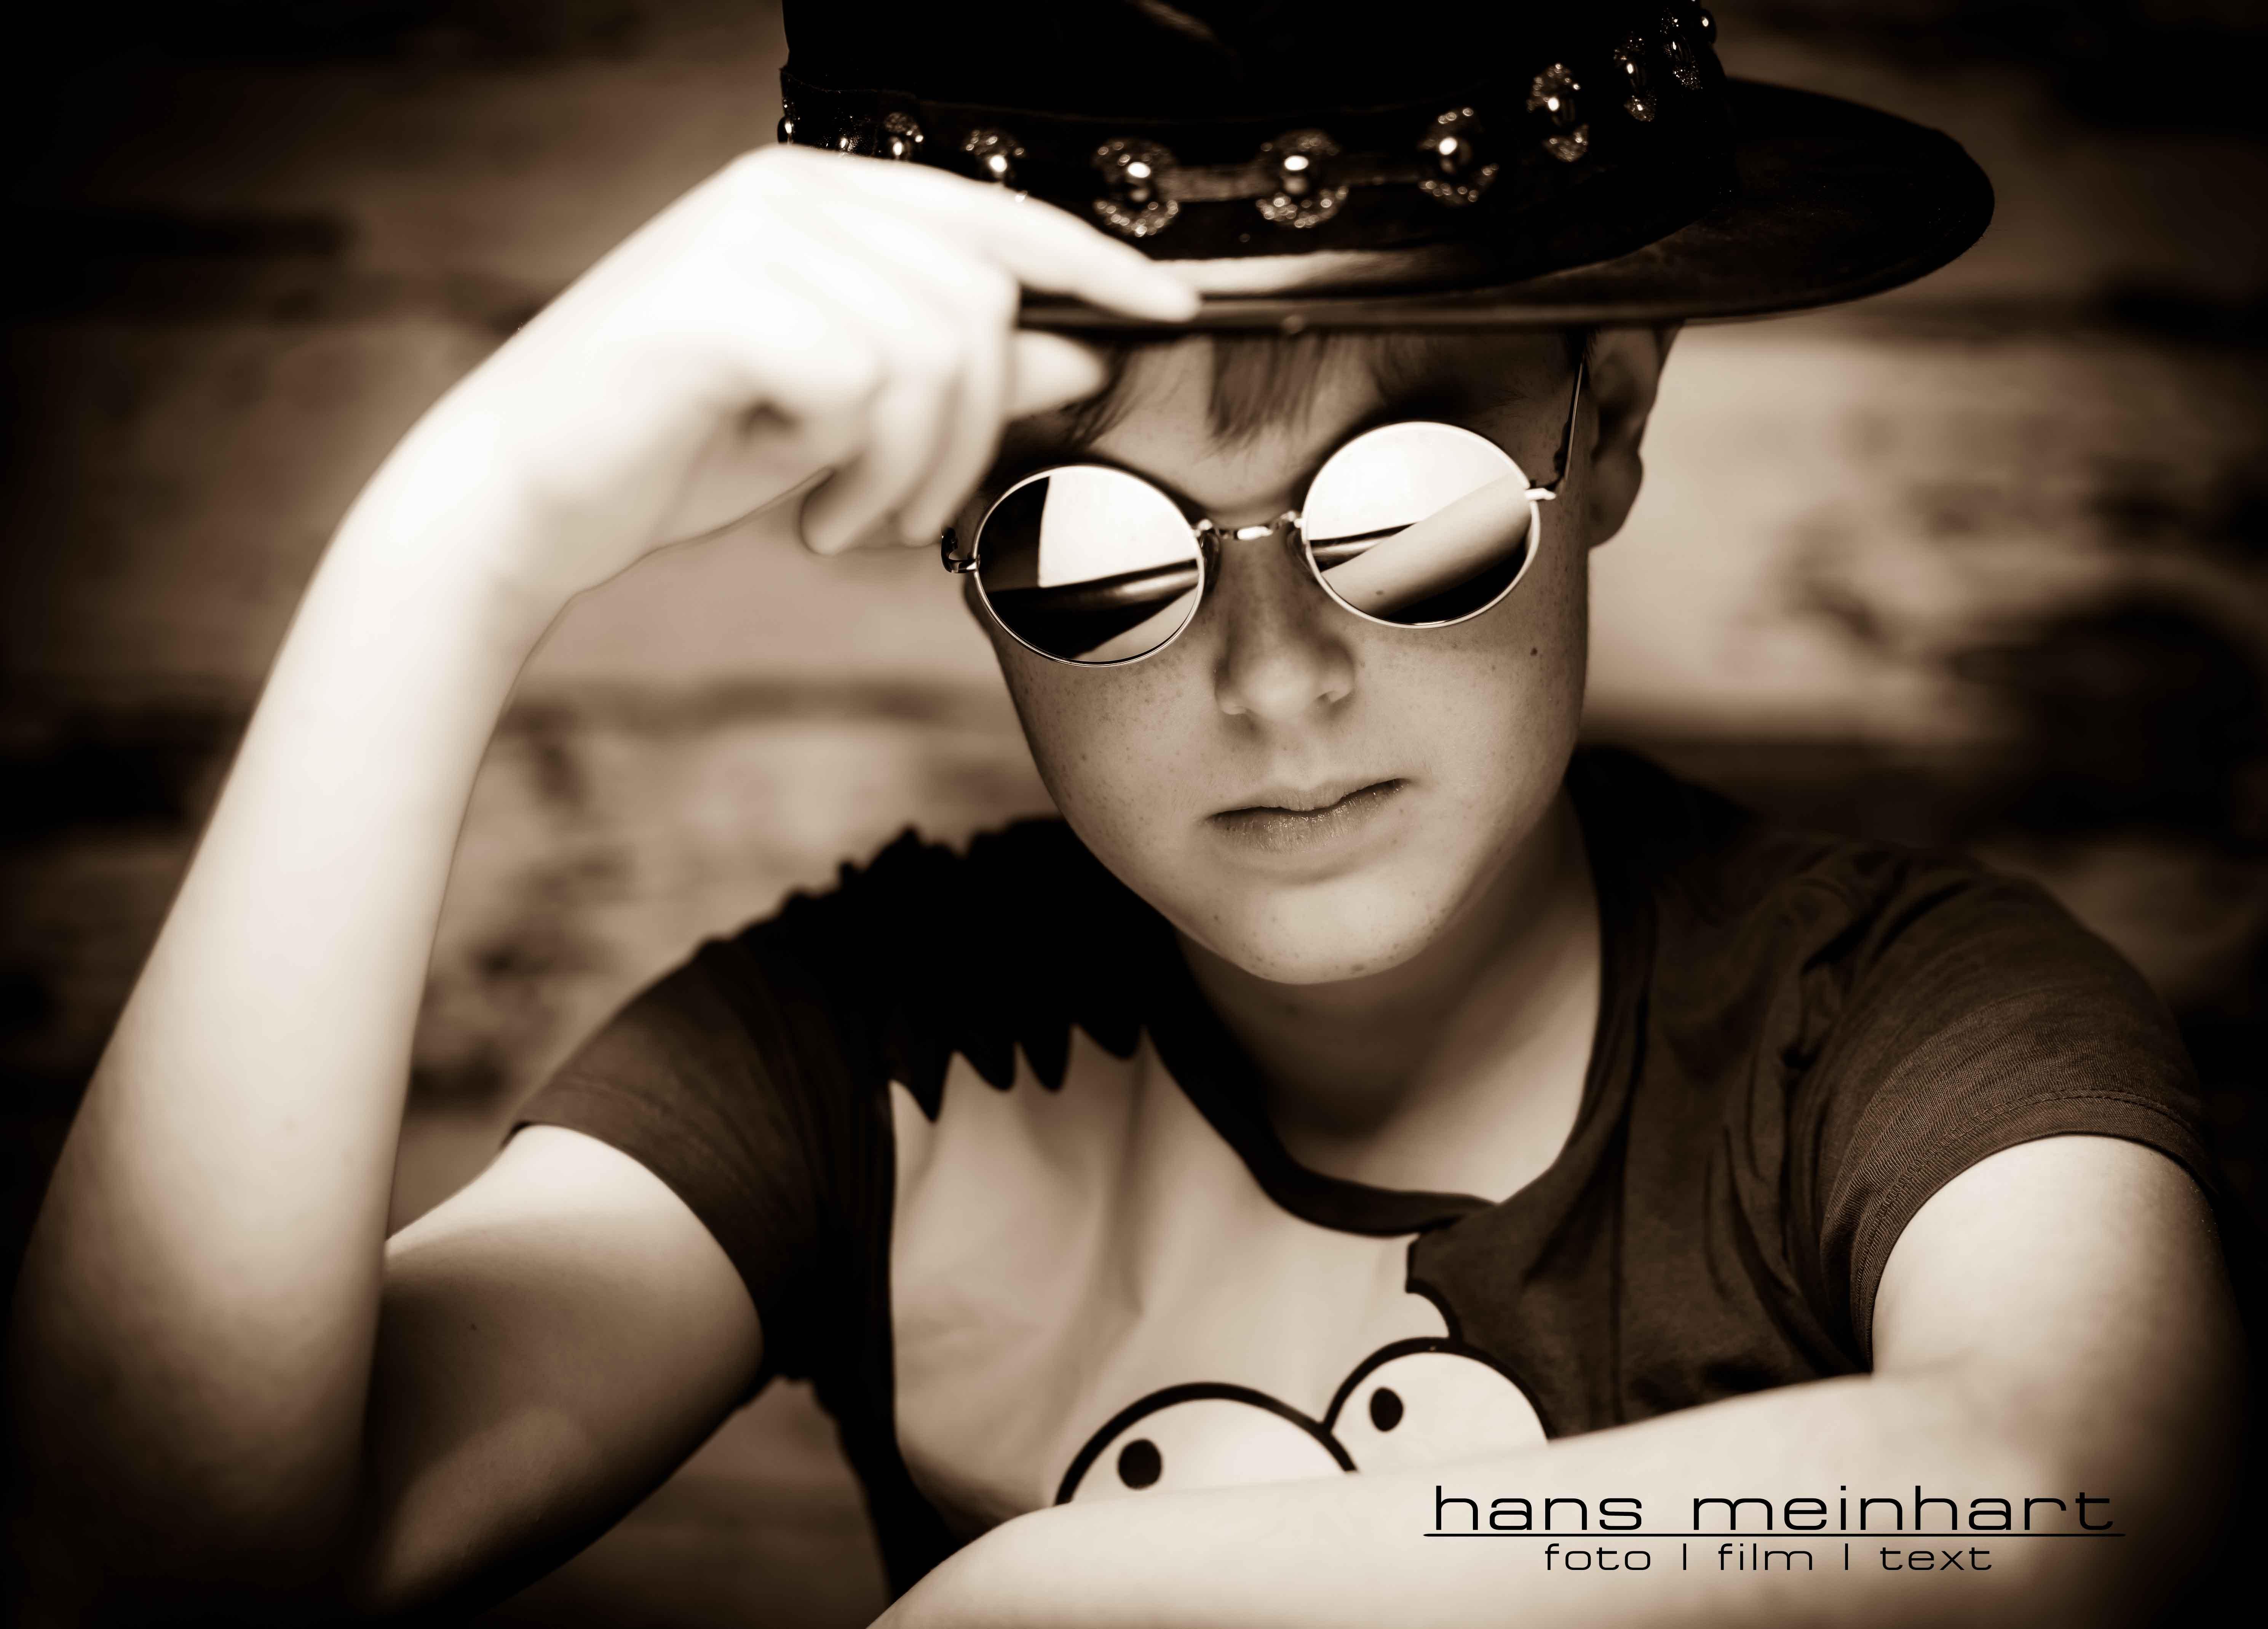 Coole Fotos eines Männer-Models